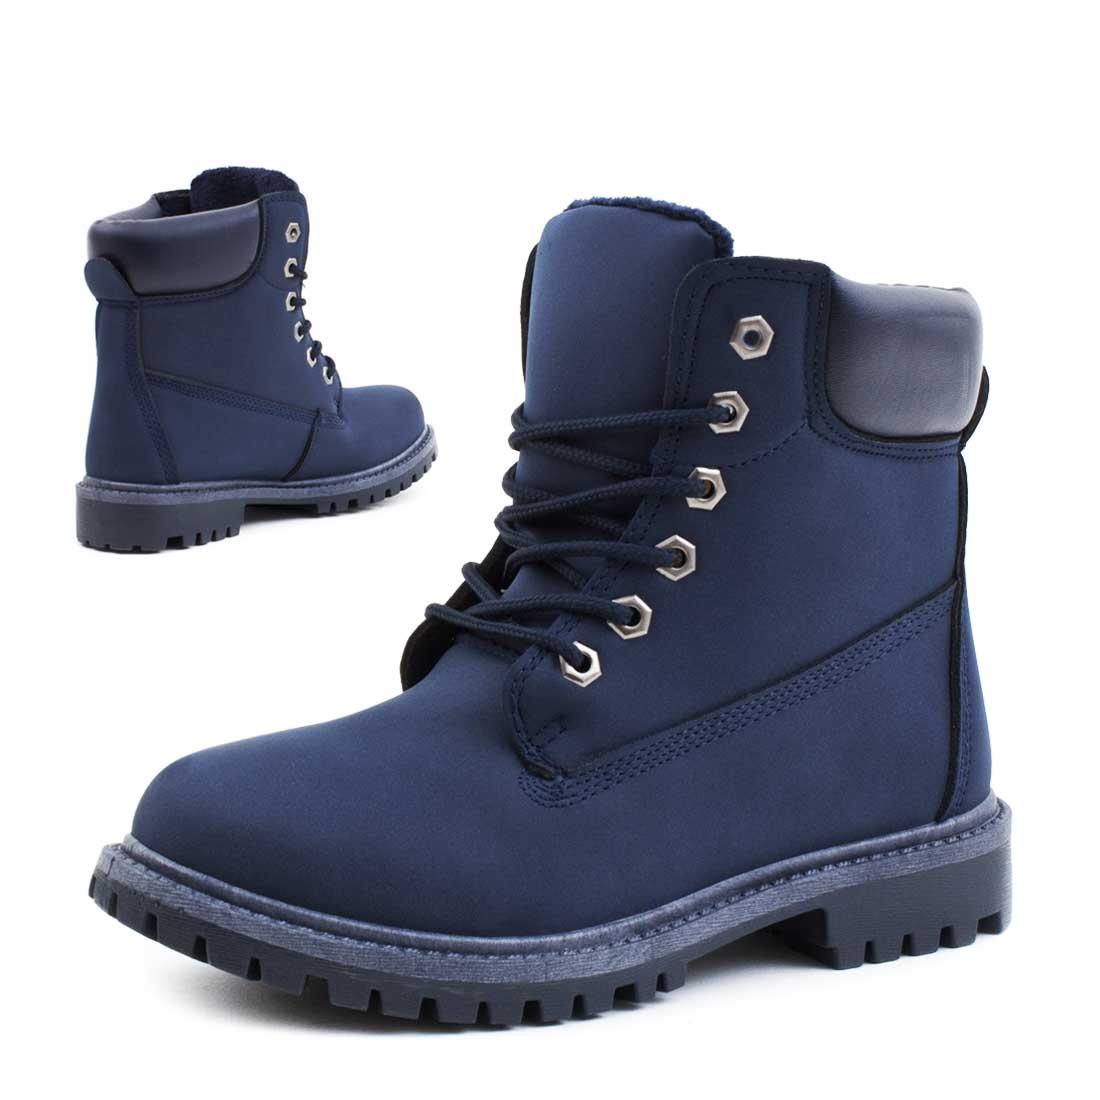 damen herren stiefel boots stiefeletten schuhe 36 37 38 39. Black Bedroom Furniture Sets. Home Design Ideas